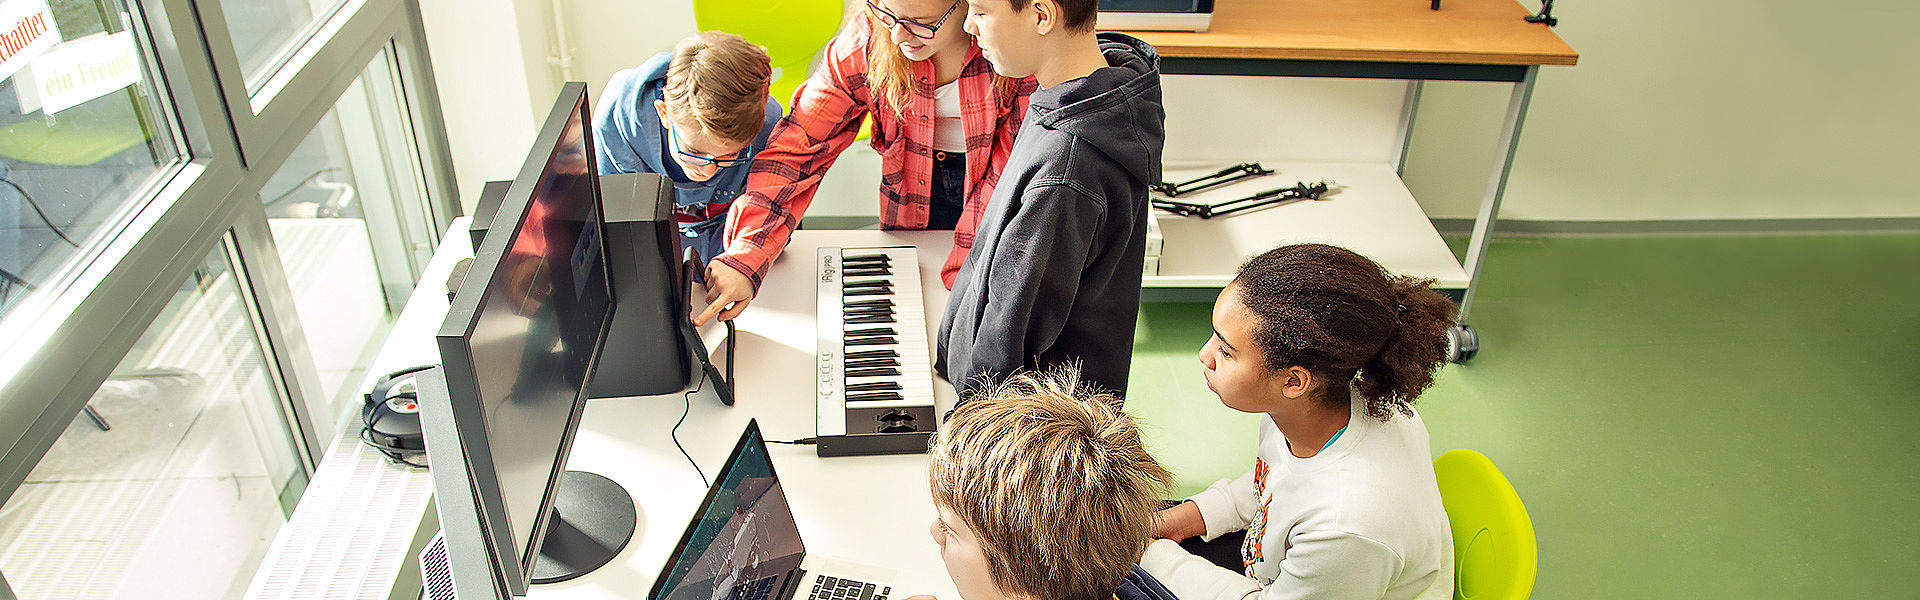 Bild: Schüler in Klassenzimmer